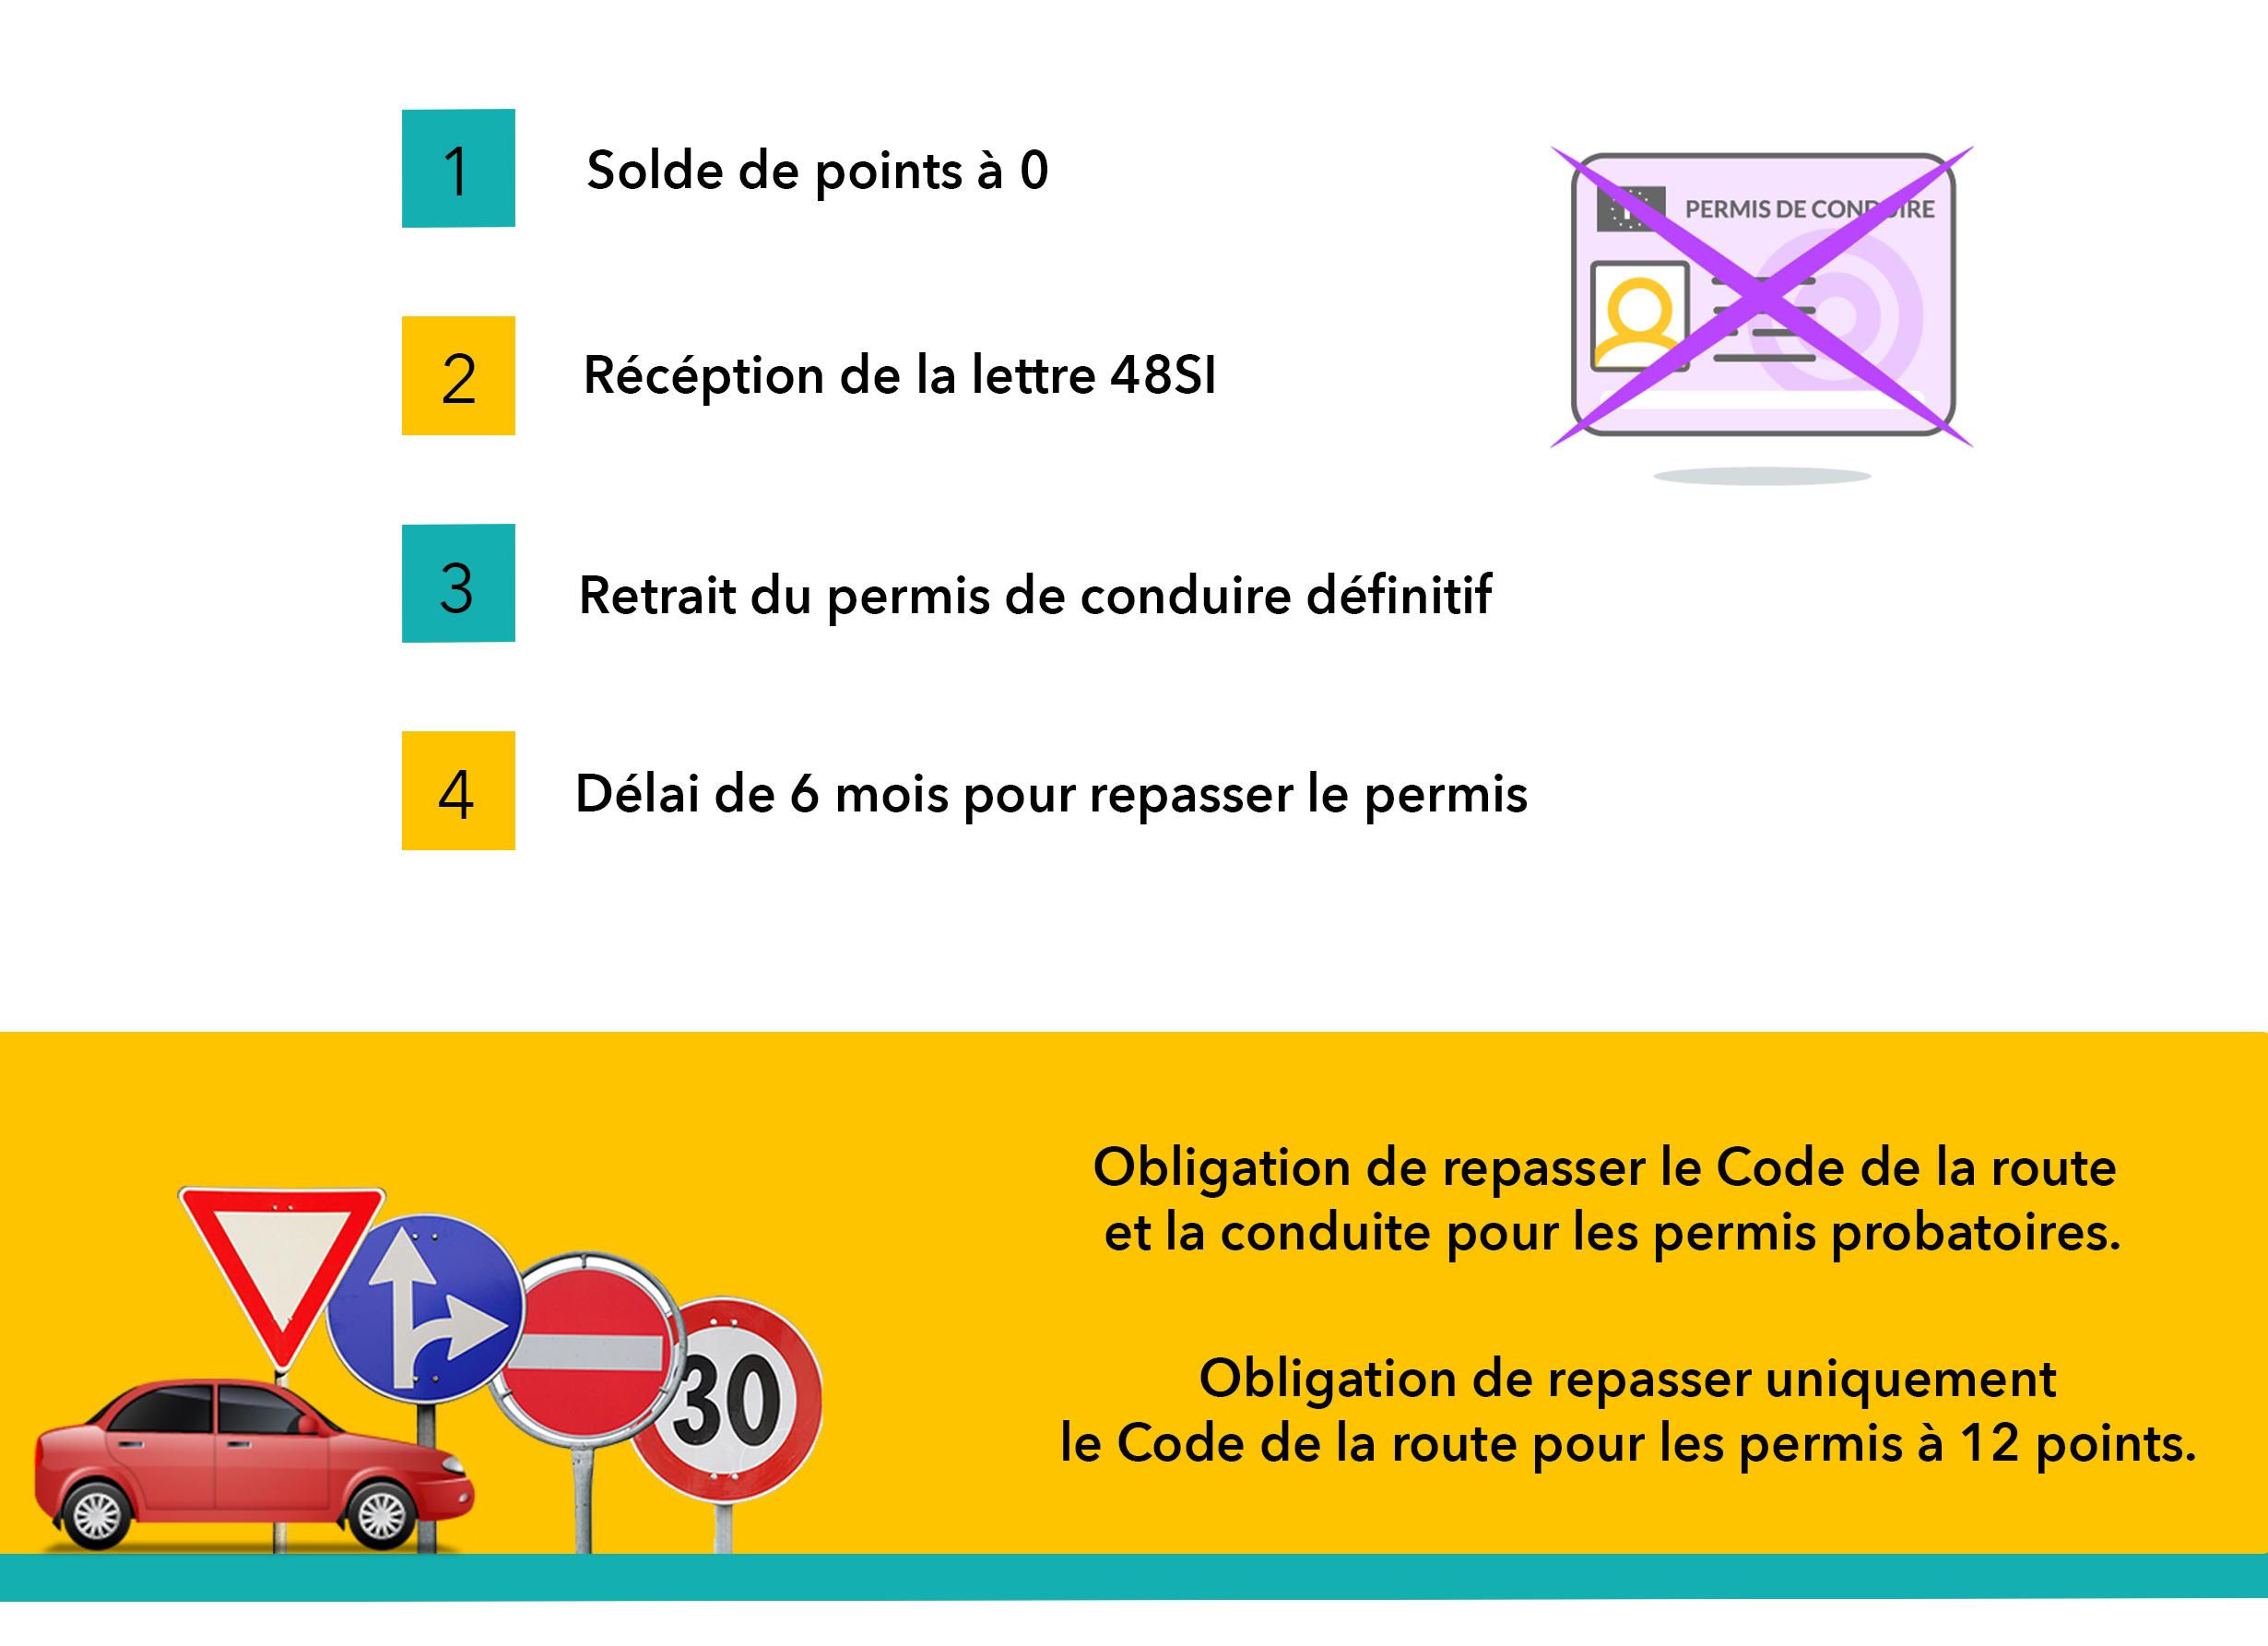 invalidation du permis de conduire